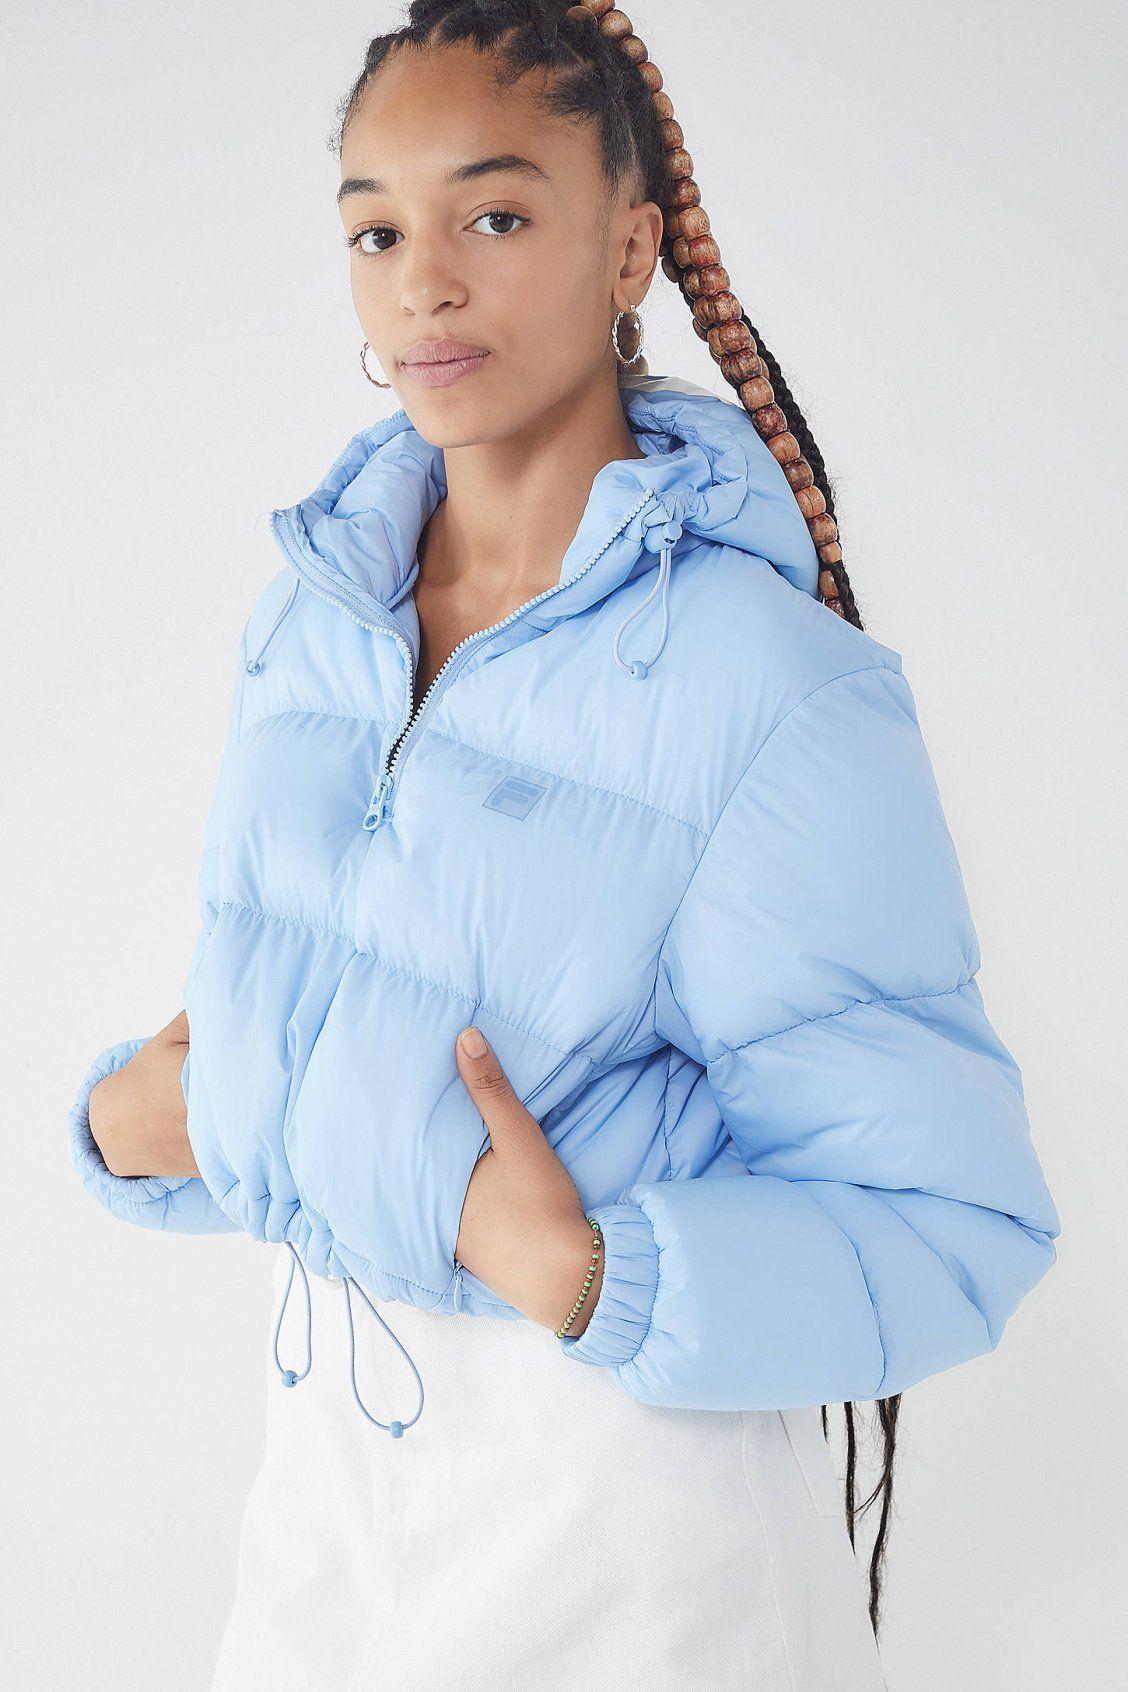 Fila Uo Exclusive Nariko Cropped Puffer Jacket Cropped Puffer Jacket Puffer Jacket Outfit Blue Puffer Jacket [ 1692 x 1128 Pixel ]